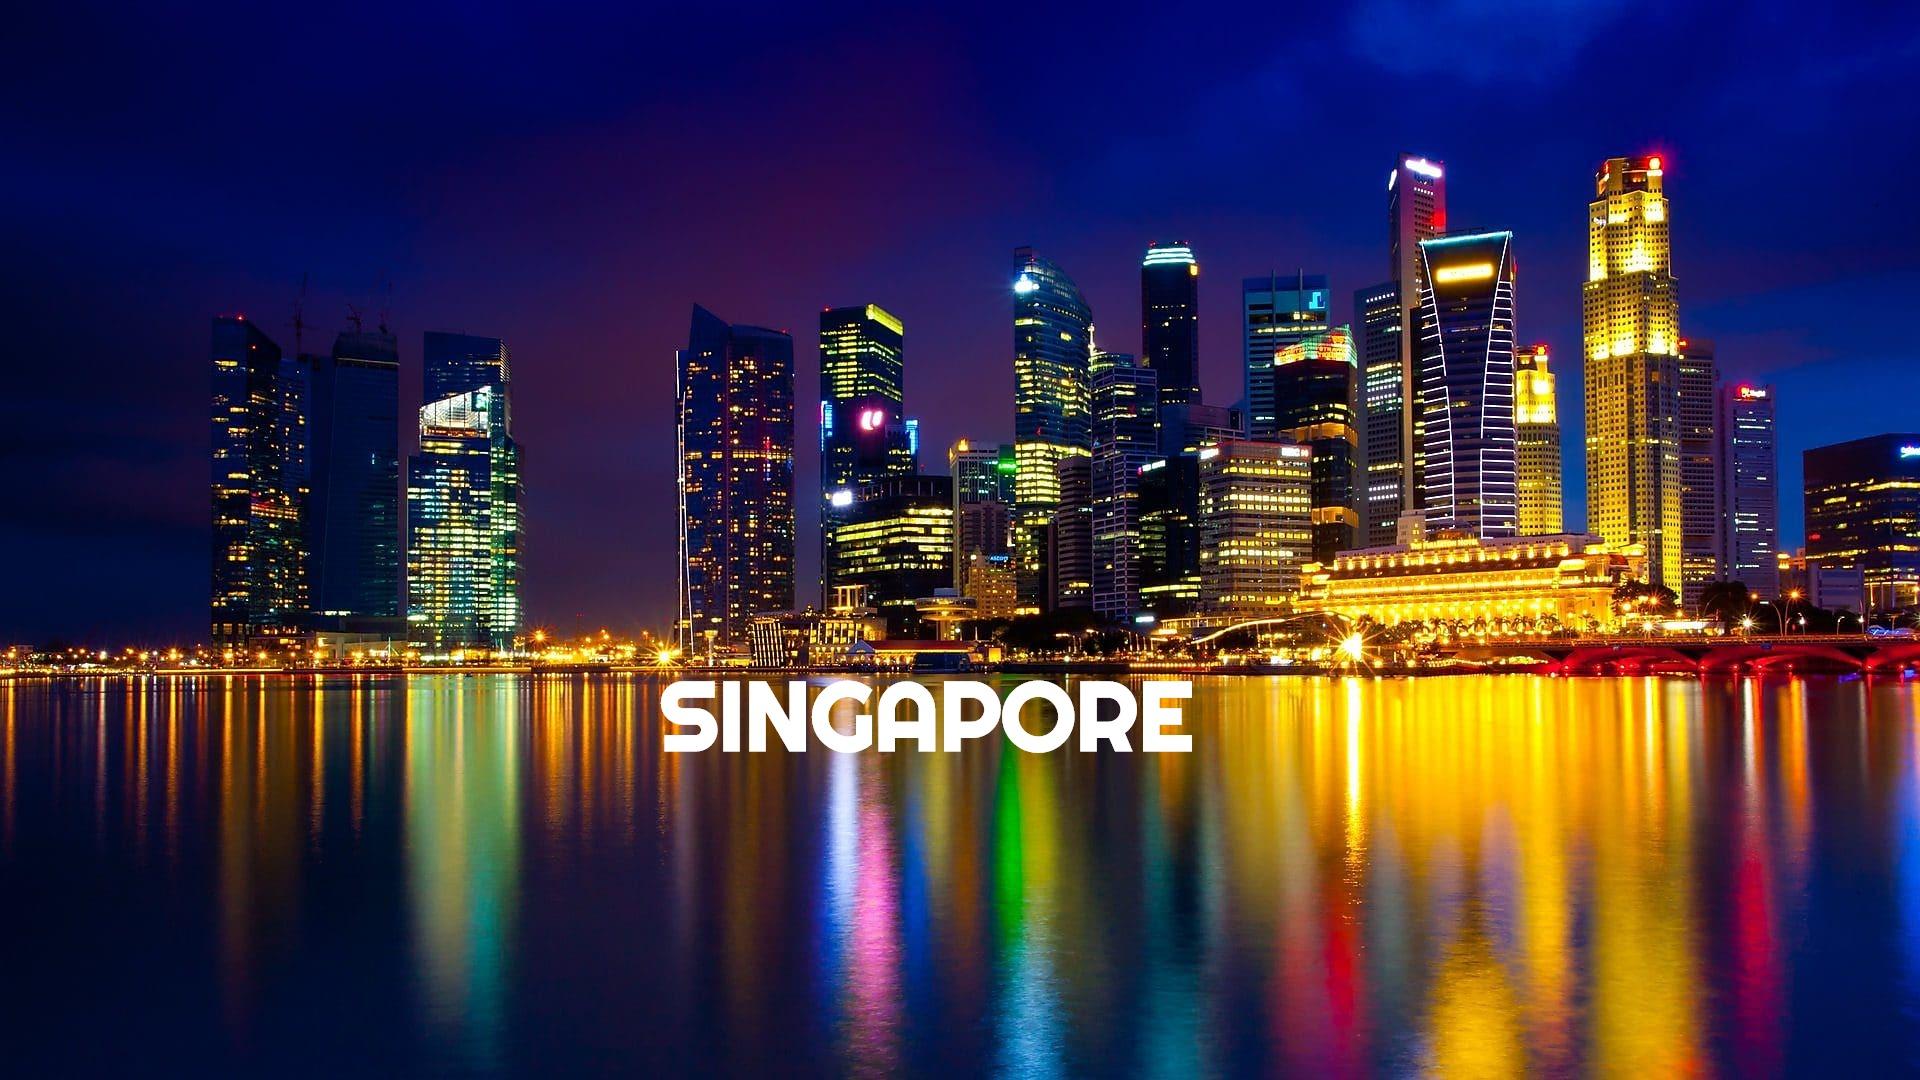 SINGAPORE_edited